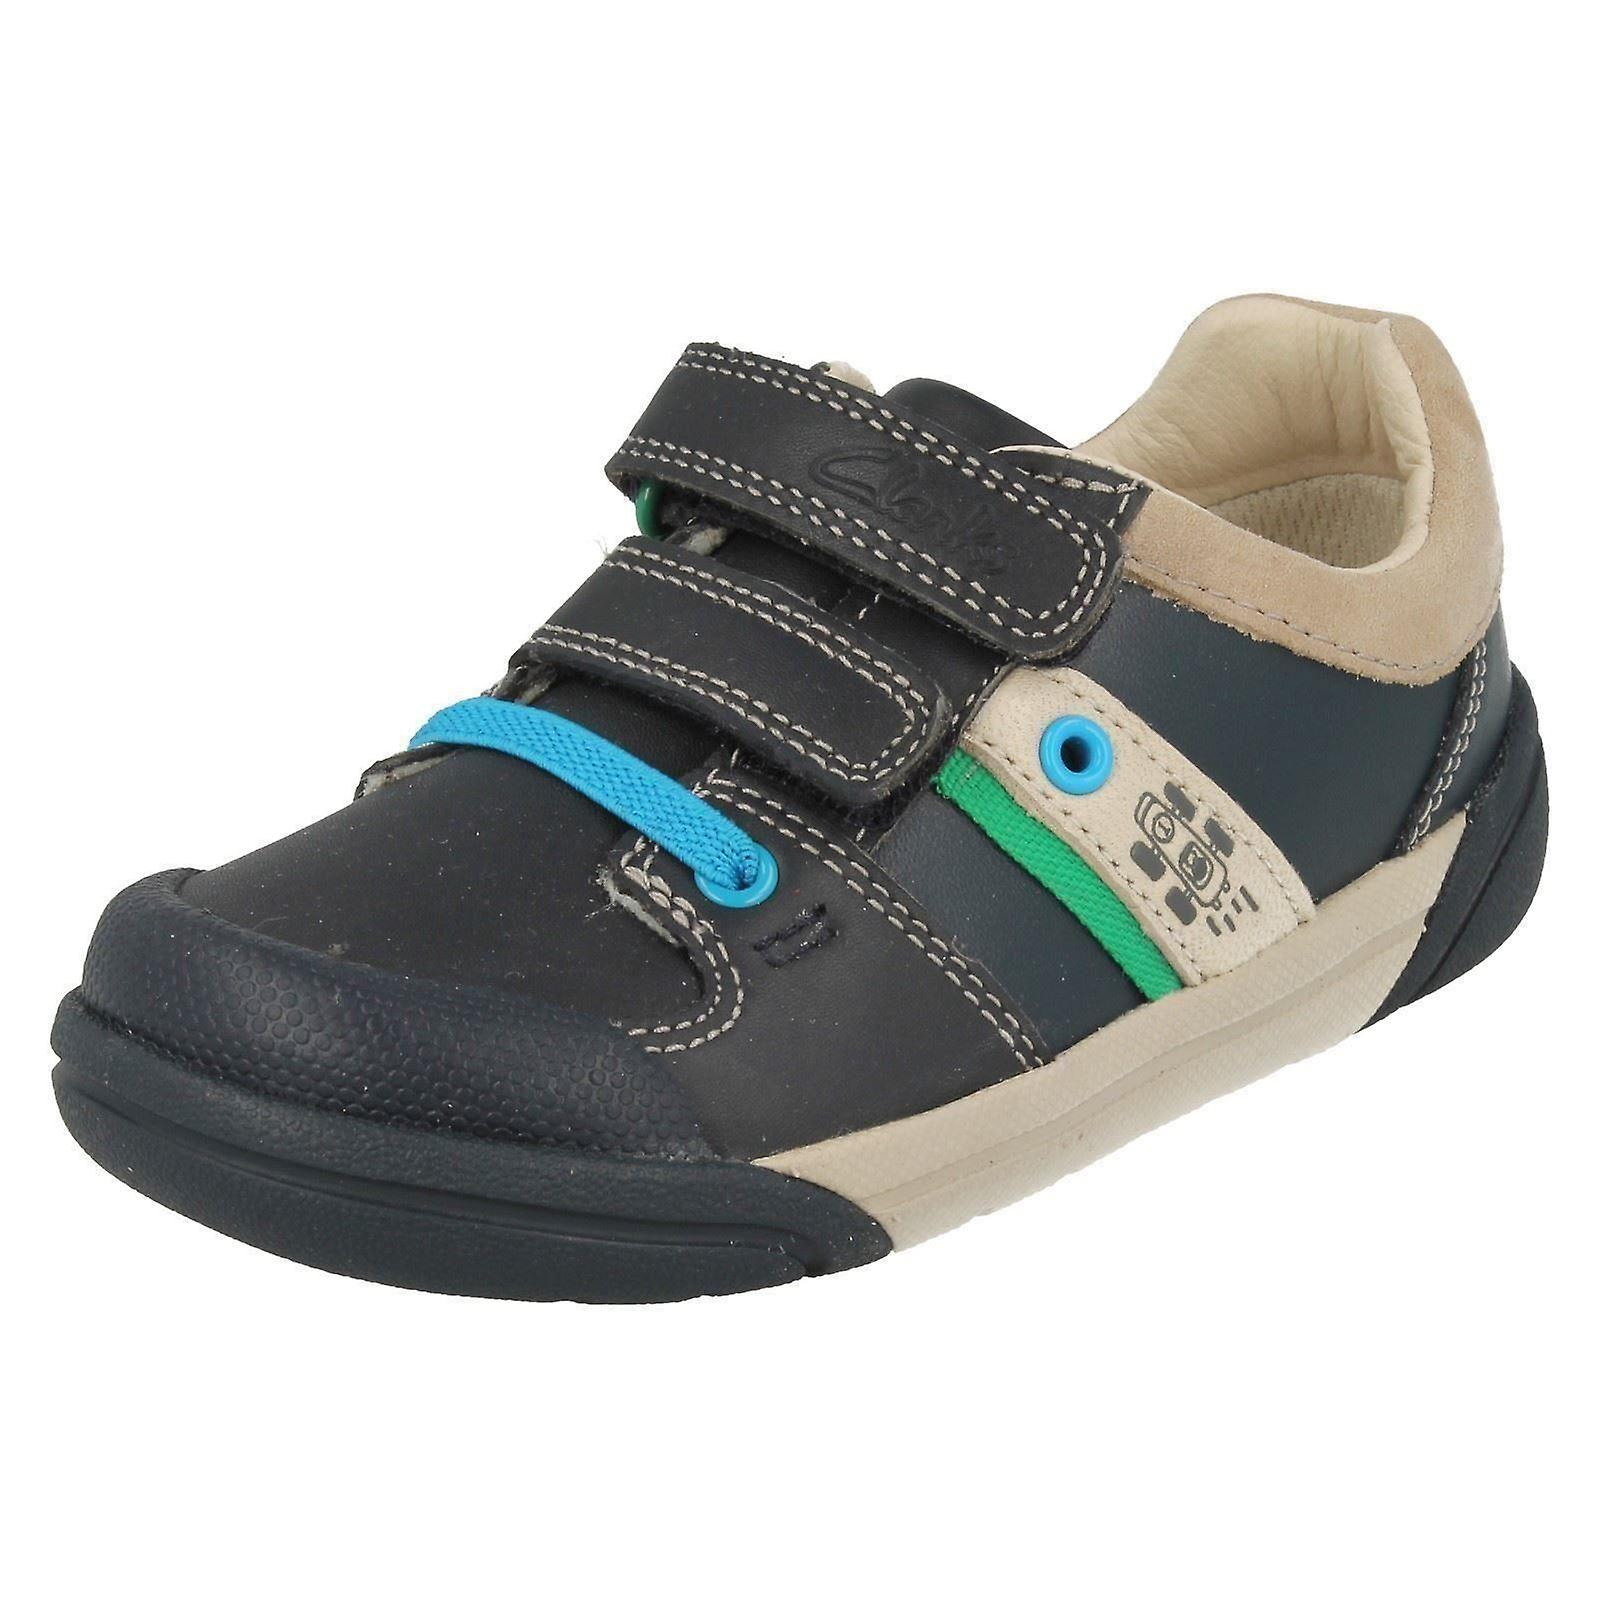 Garçons Lilfolkcub de Décontracté chaussures Clarks